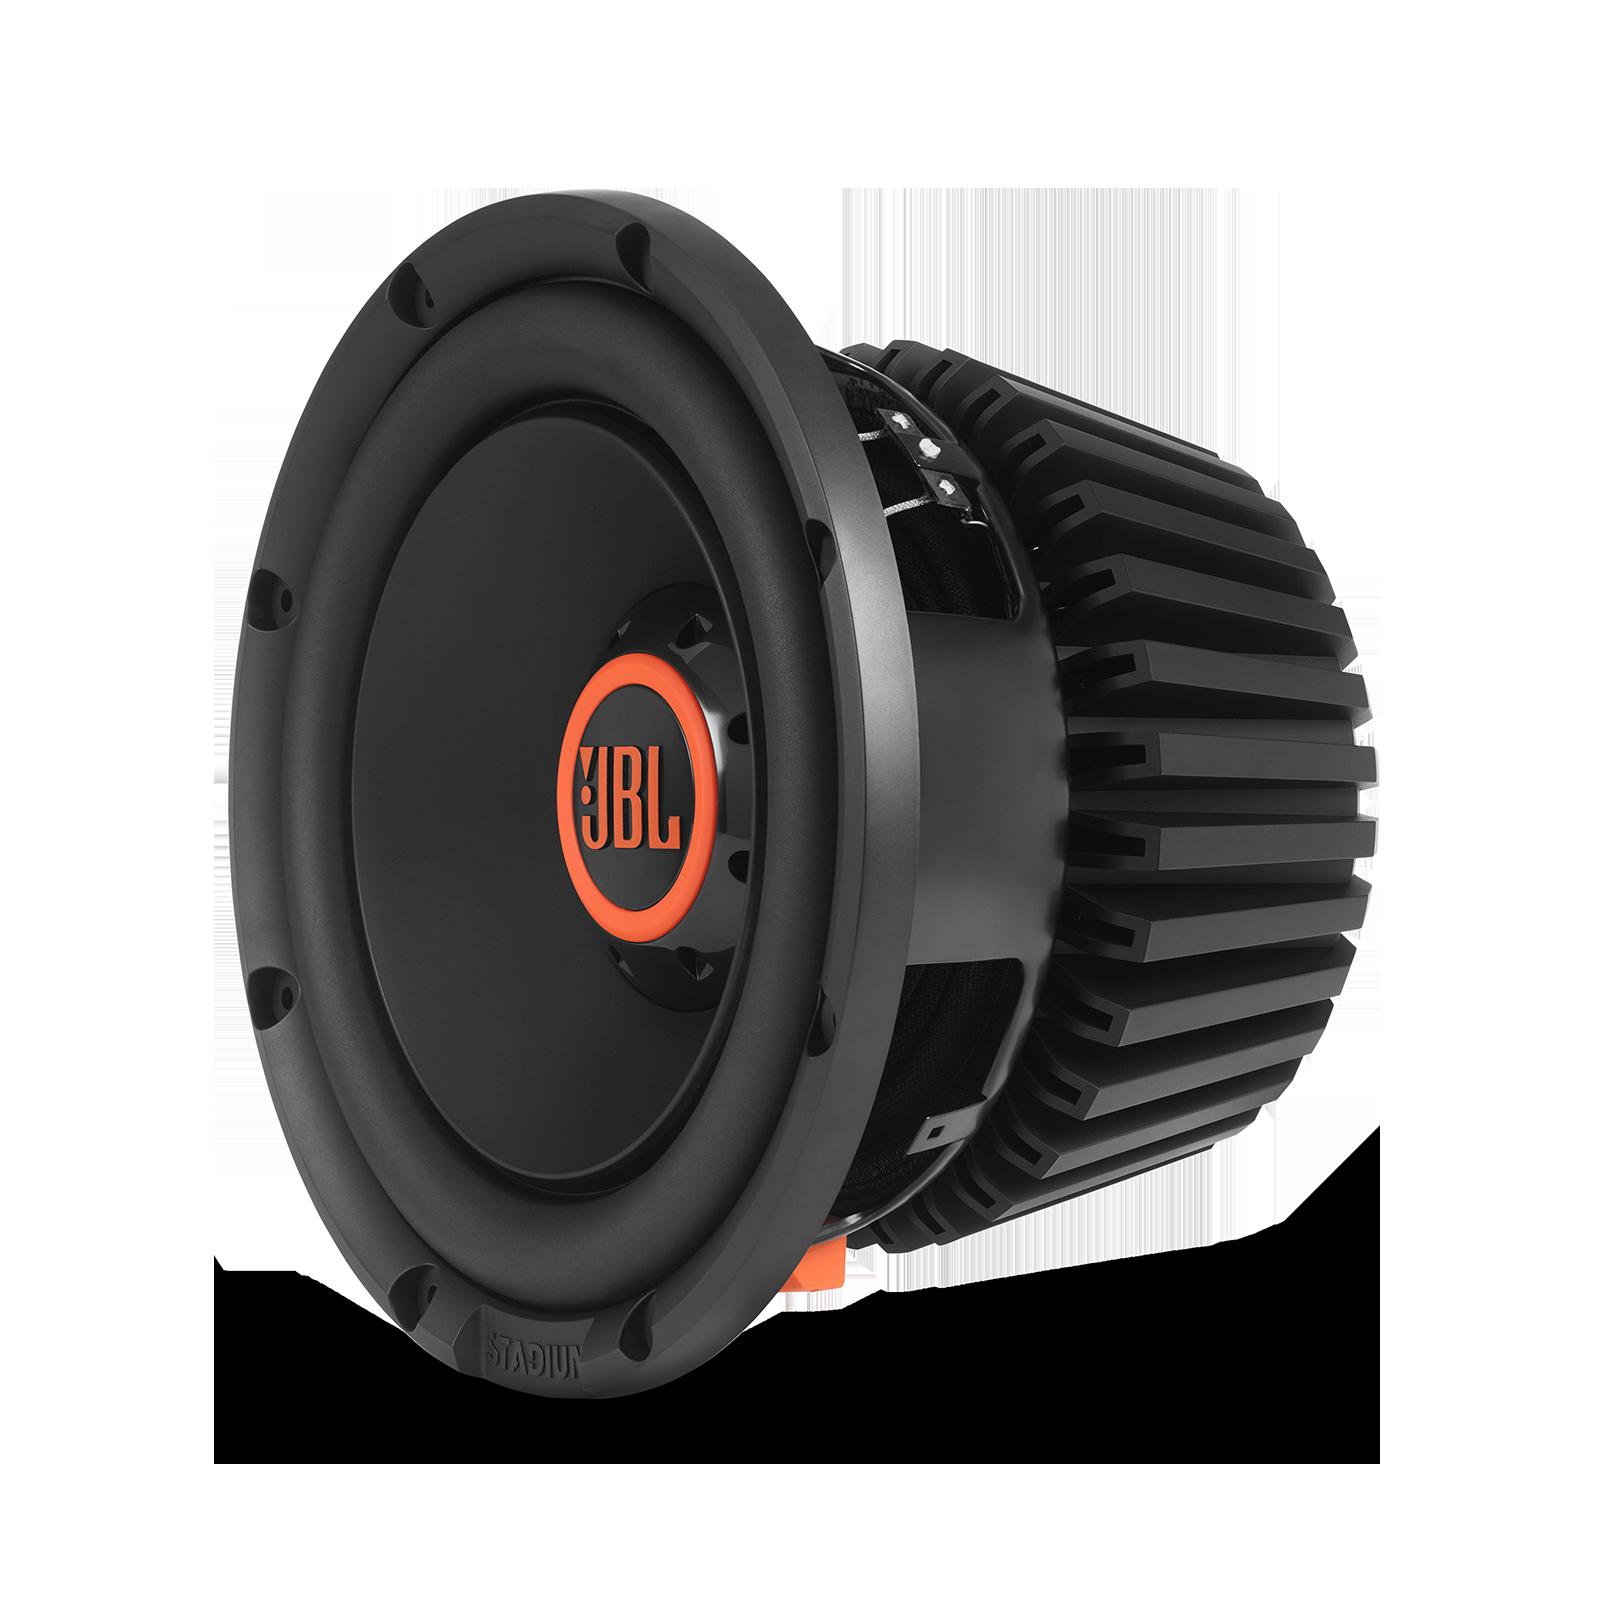 jbl stadium 1024 10 250mm high performance car audio. Black Bedroom Furniture Sets. Home Design Ideas